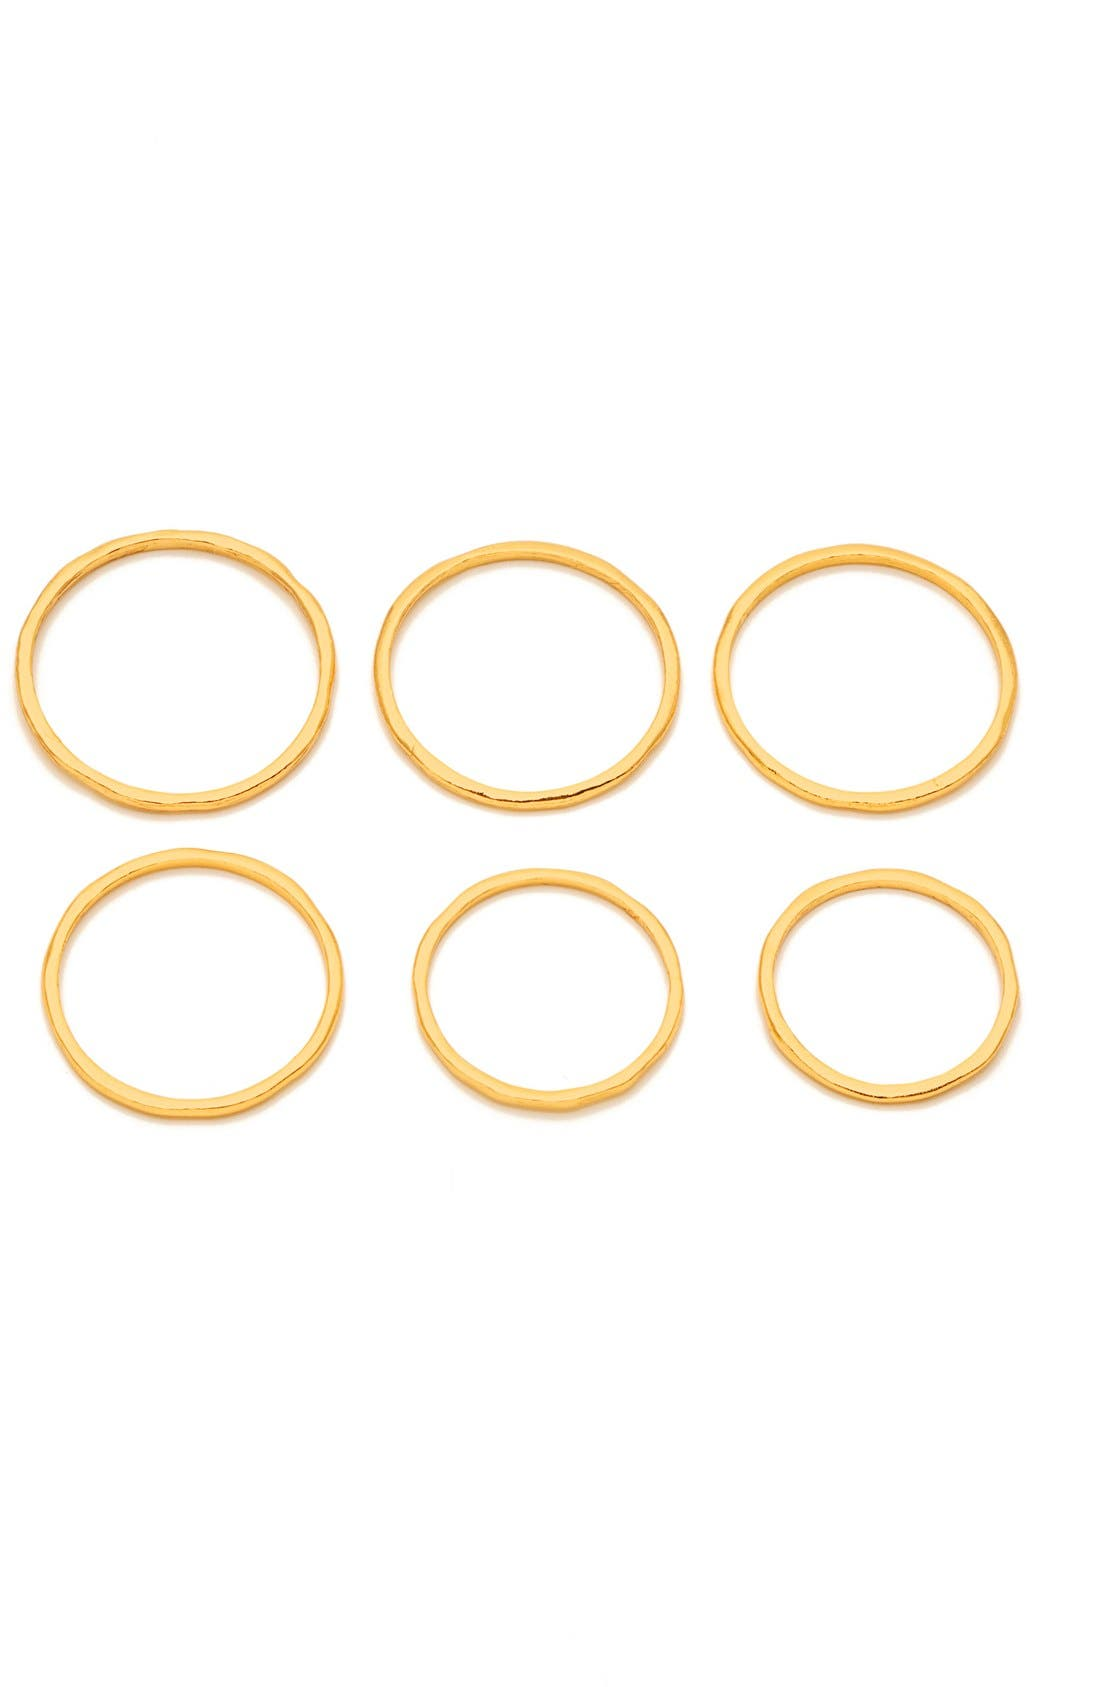 Alternate Image 2  - gorjana 'G' Stacking Rings (Set of 6)